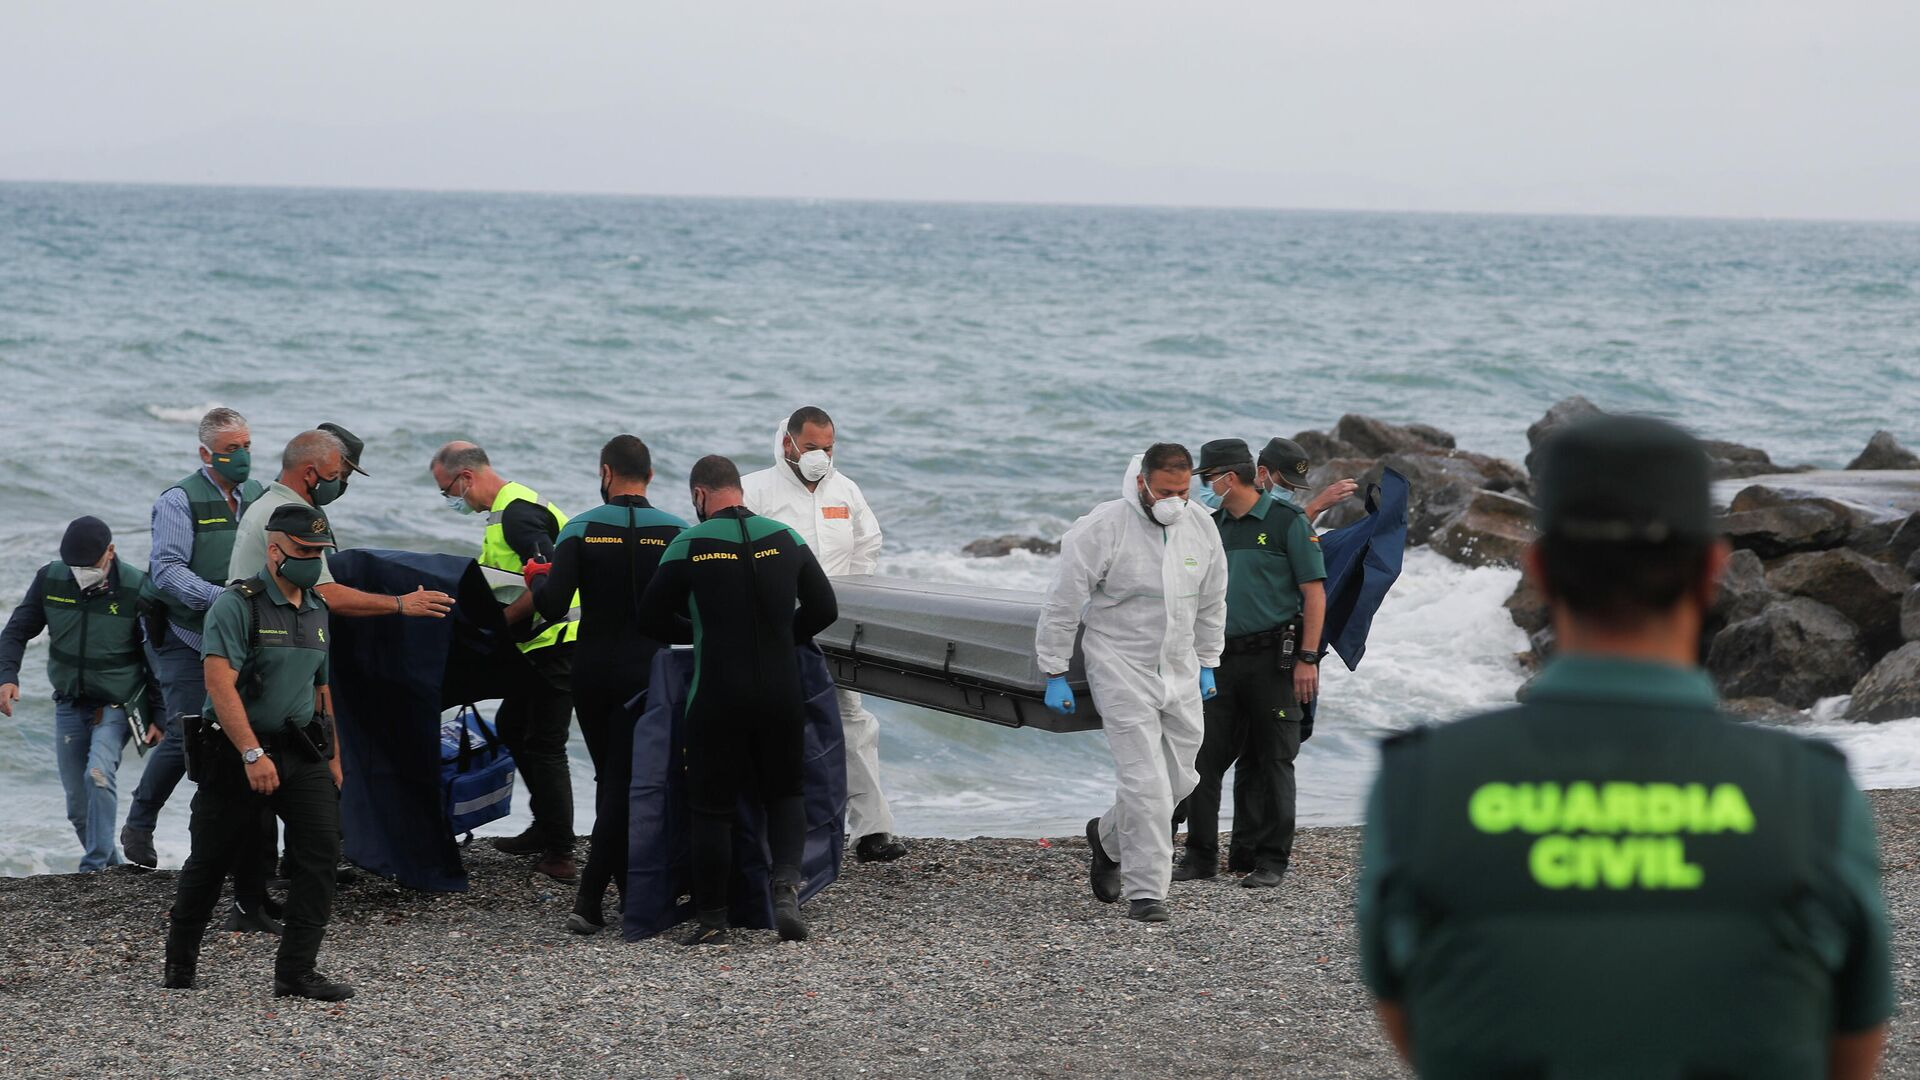 La Guardia Civil encuentra el cadáver de una persona en la playa del Tarajal, en Ceuta - Sputnik Mundo, 1920, 20.05.2021